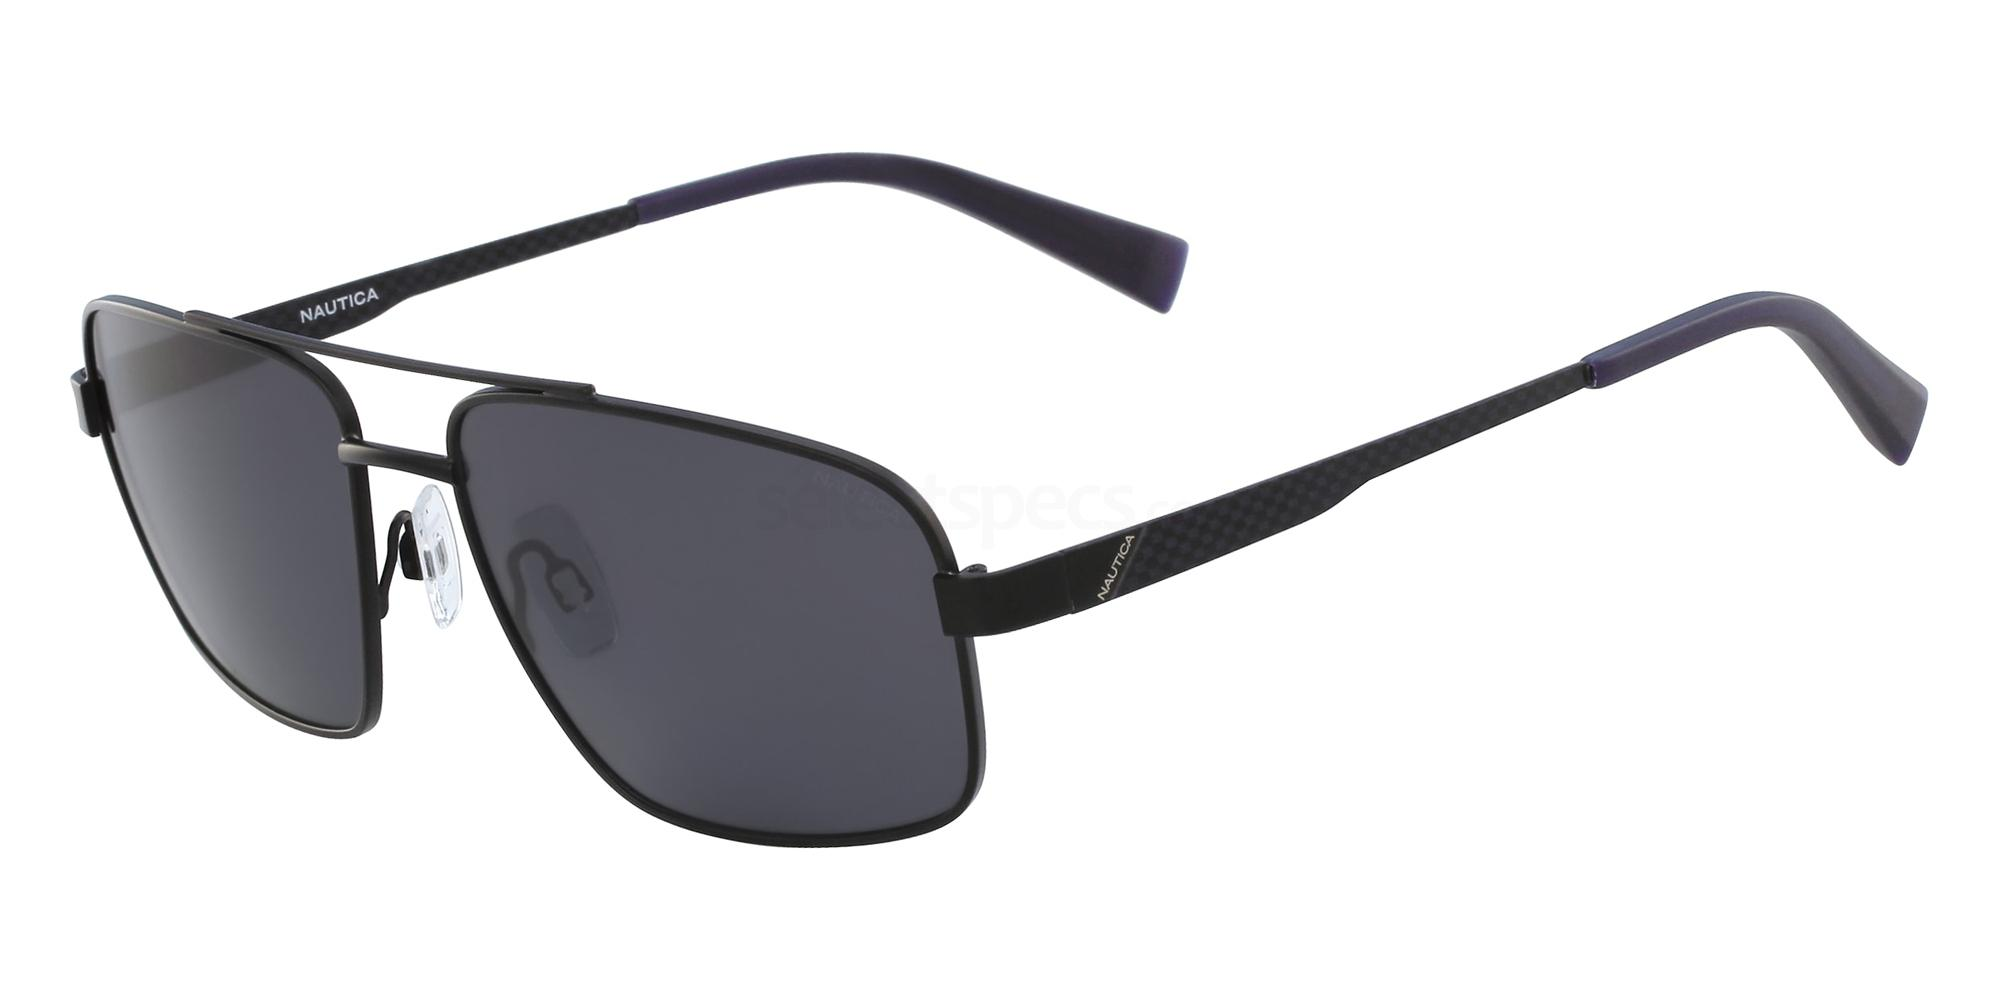 005 N5119S Sunglasses, Nautica